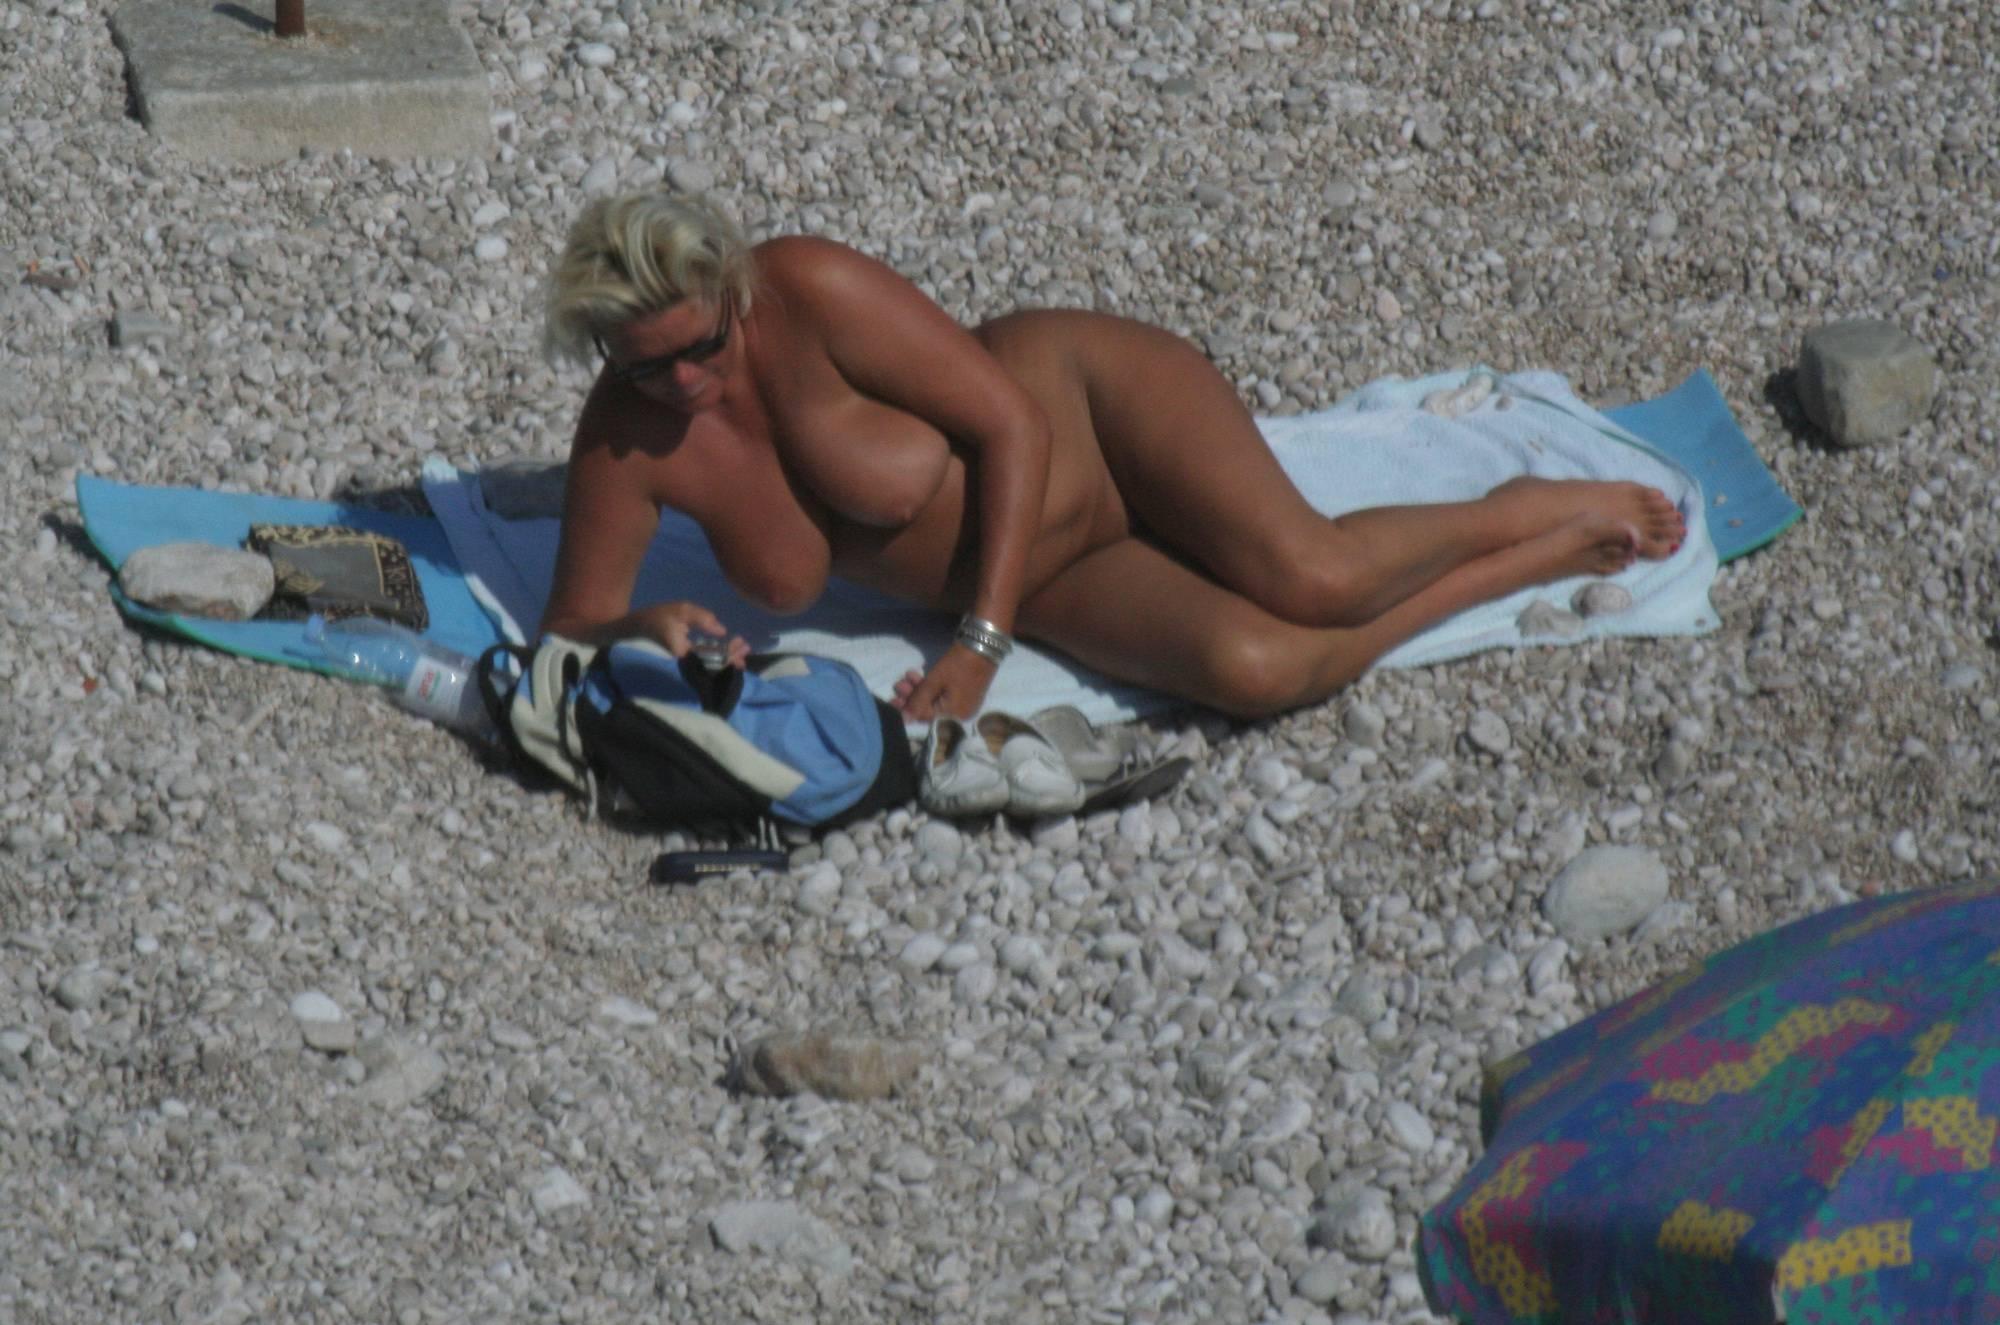 Croatian Baska Beach Day - 2